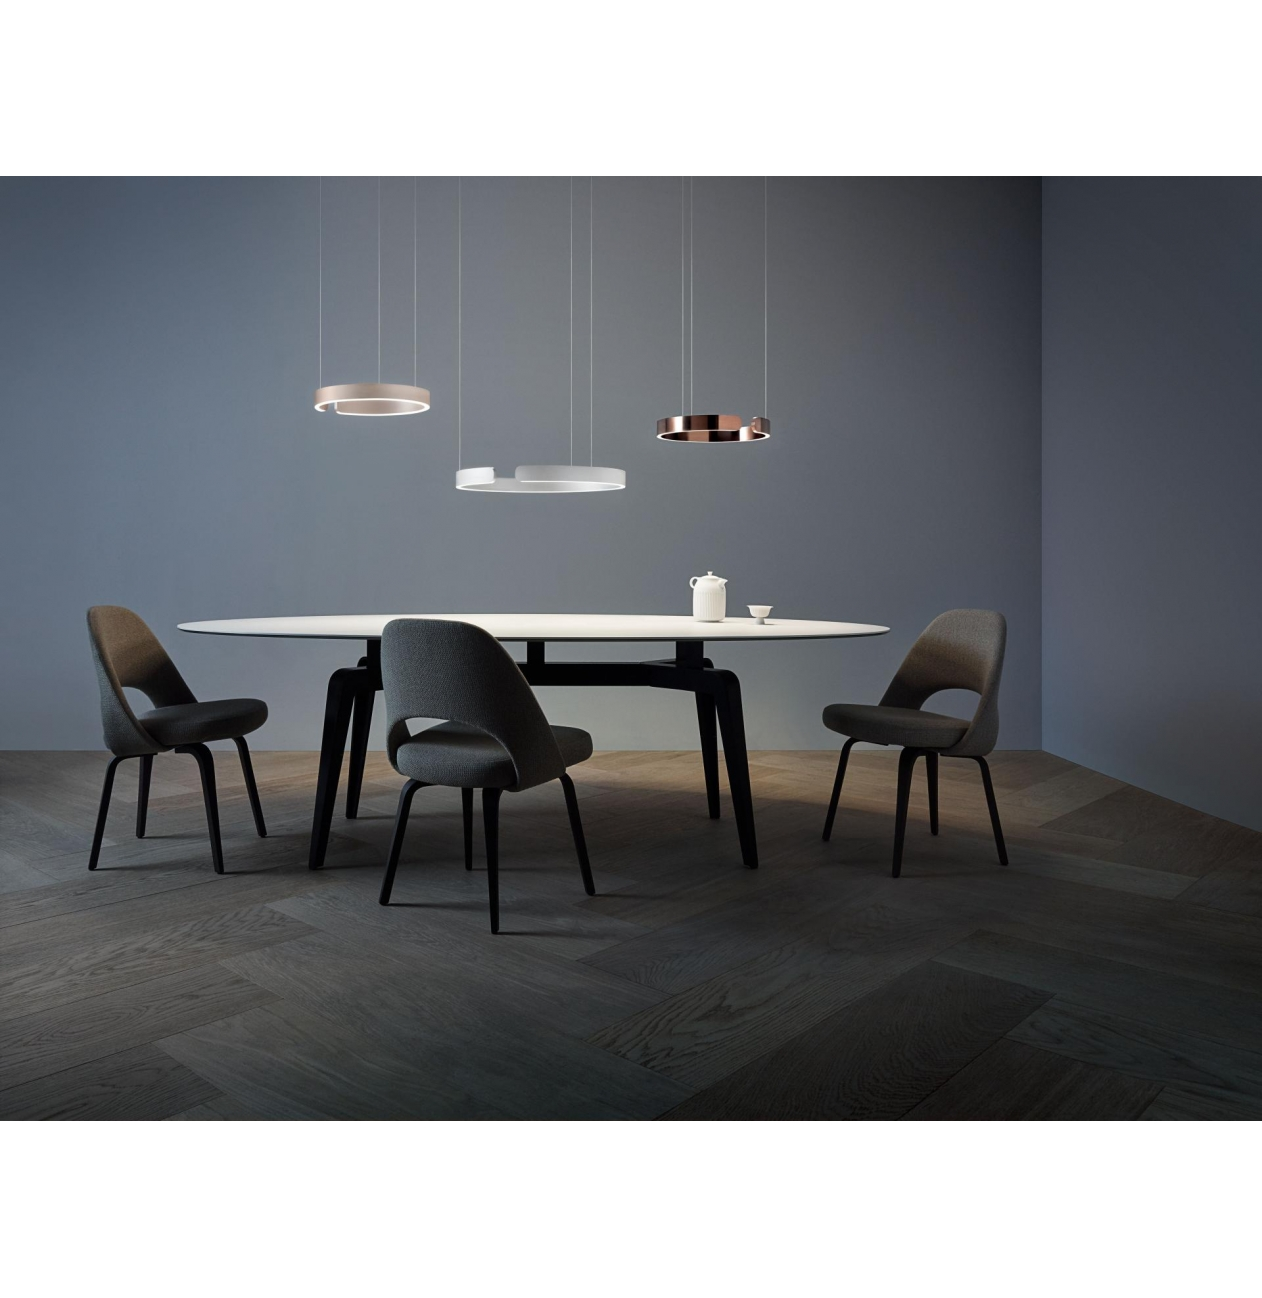 occhio hanglamp mito sospeso up 40 cm vast versteeg. Black Bedroom Furniture Sets. Home Design Ideas